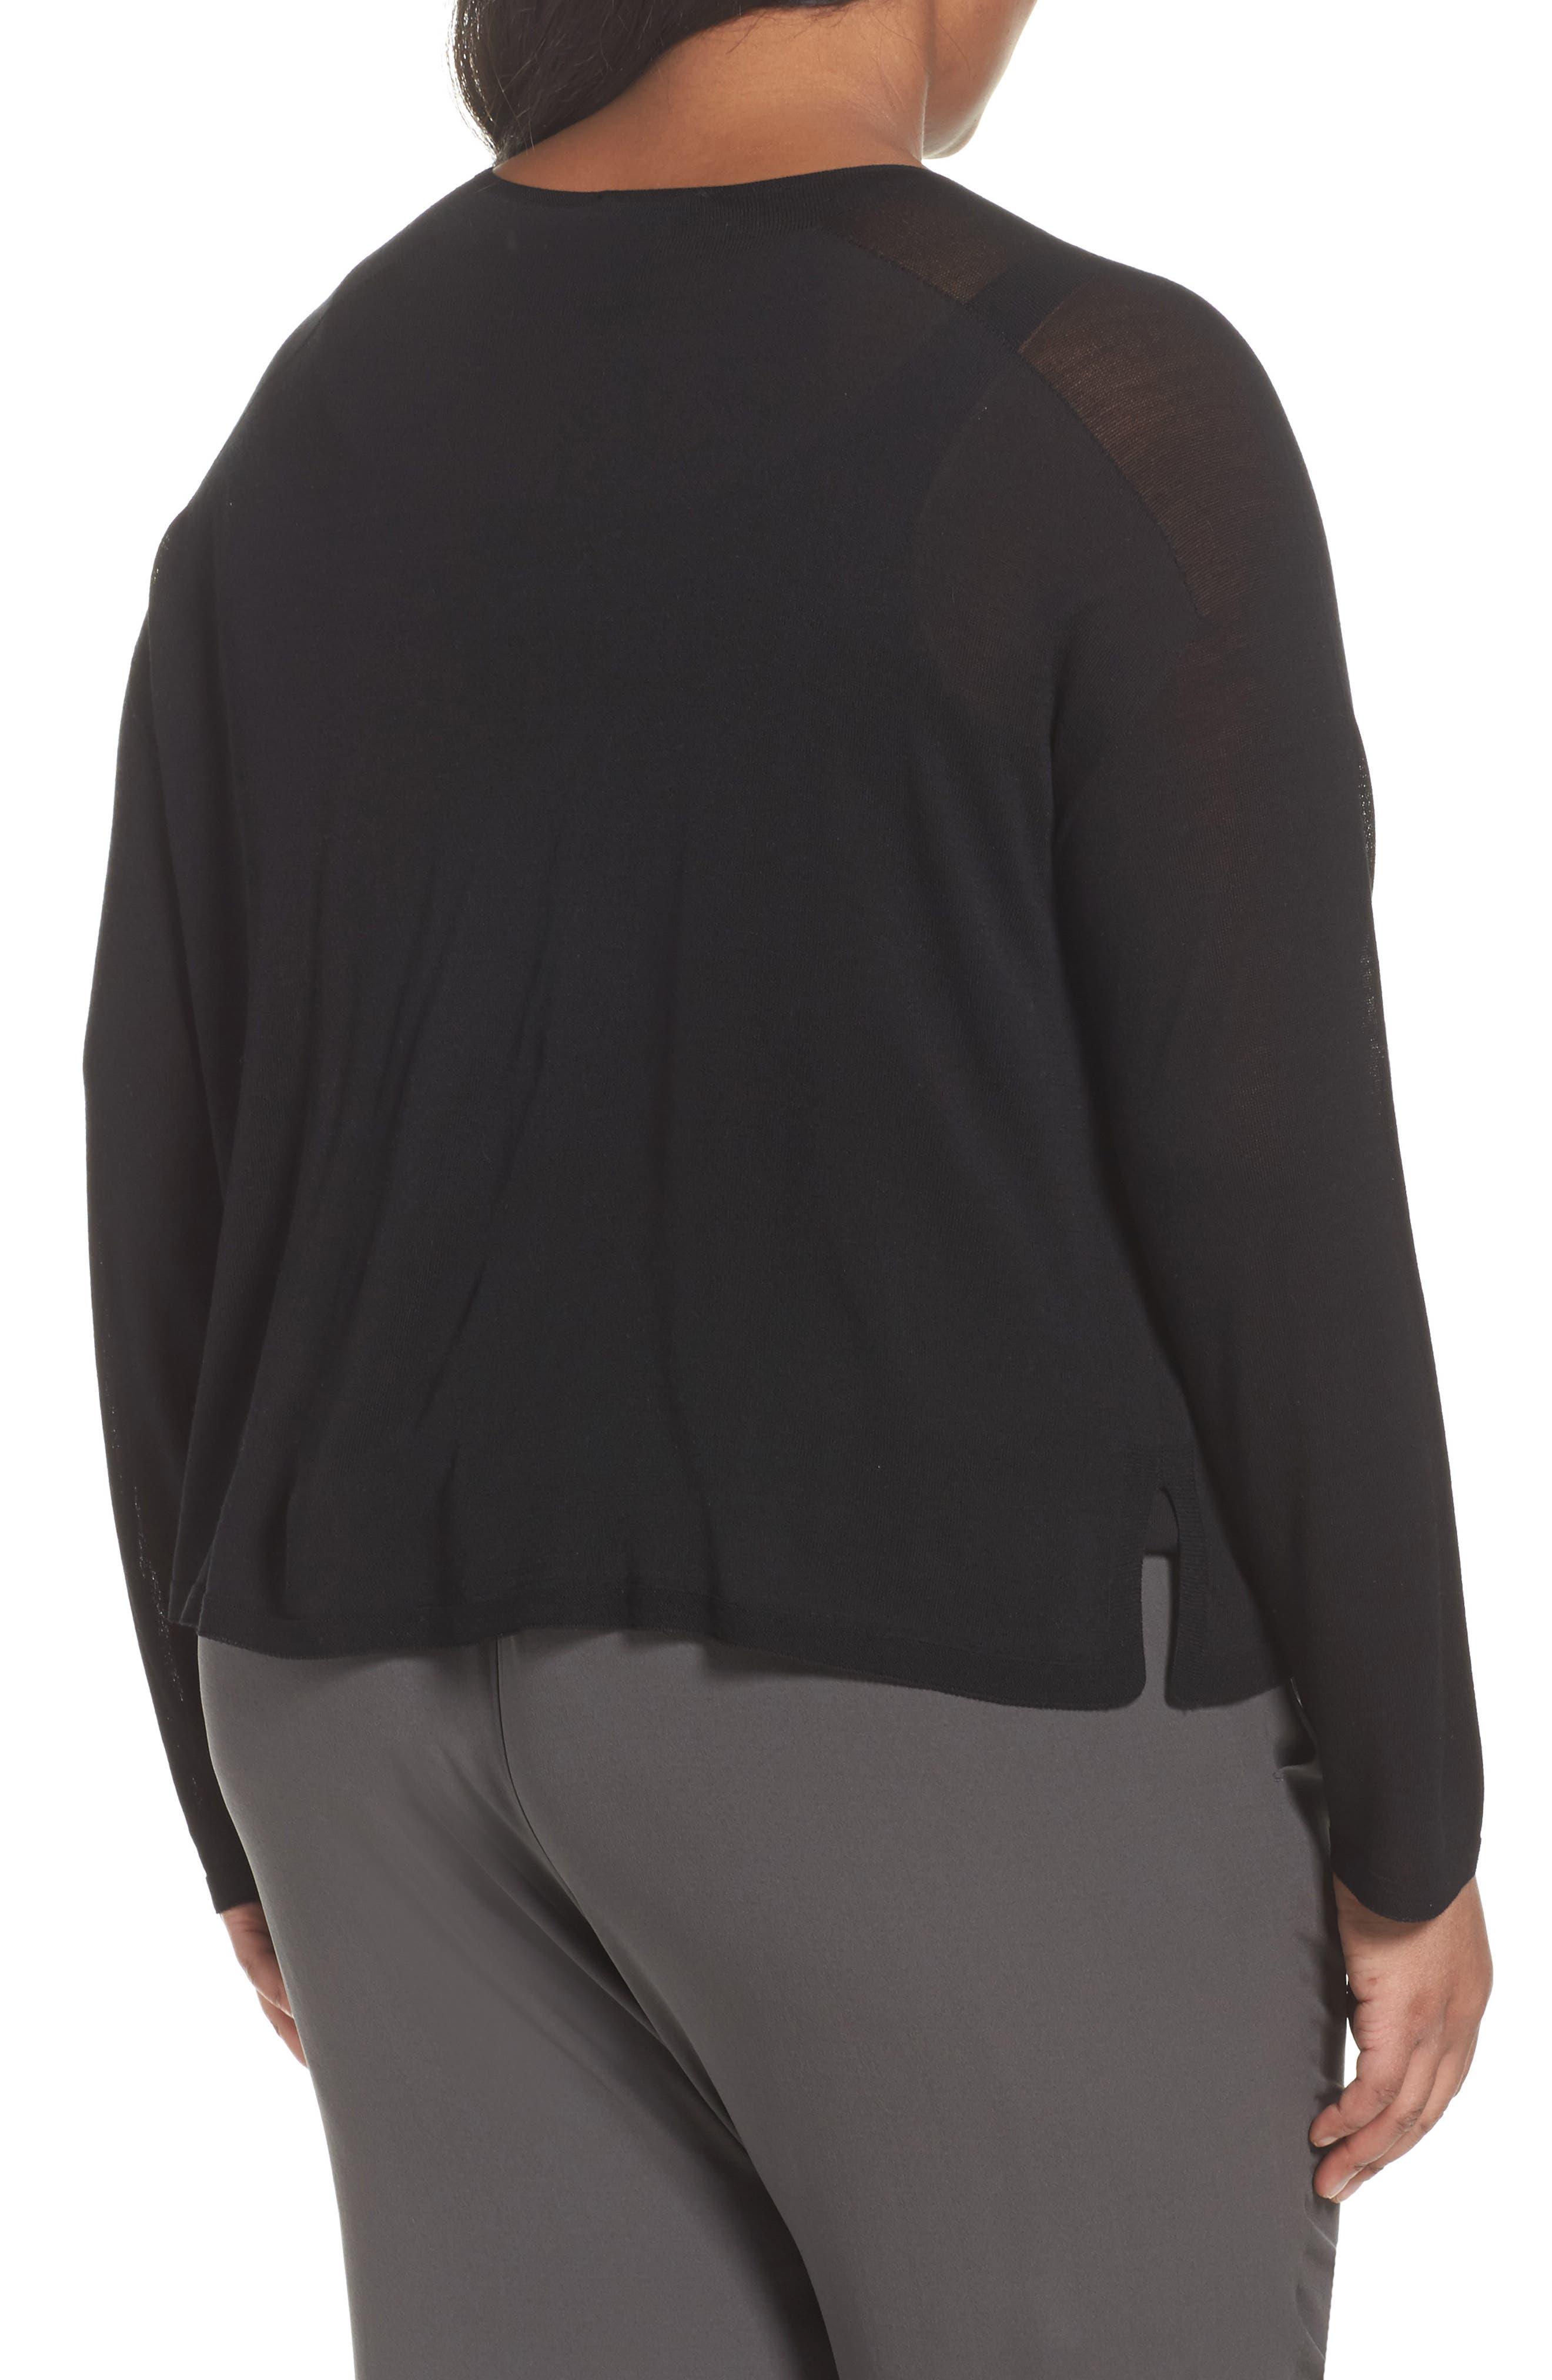 Alternate Image 2  - Eileen Fisher Tencel® Knit Top (Plus Size)